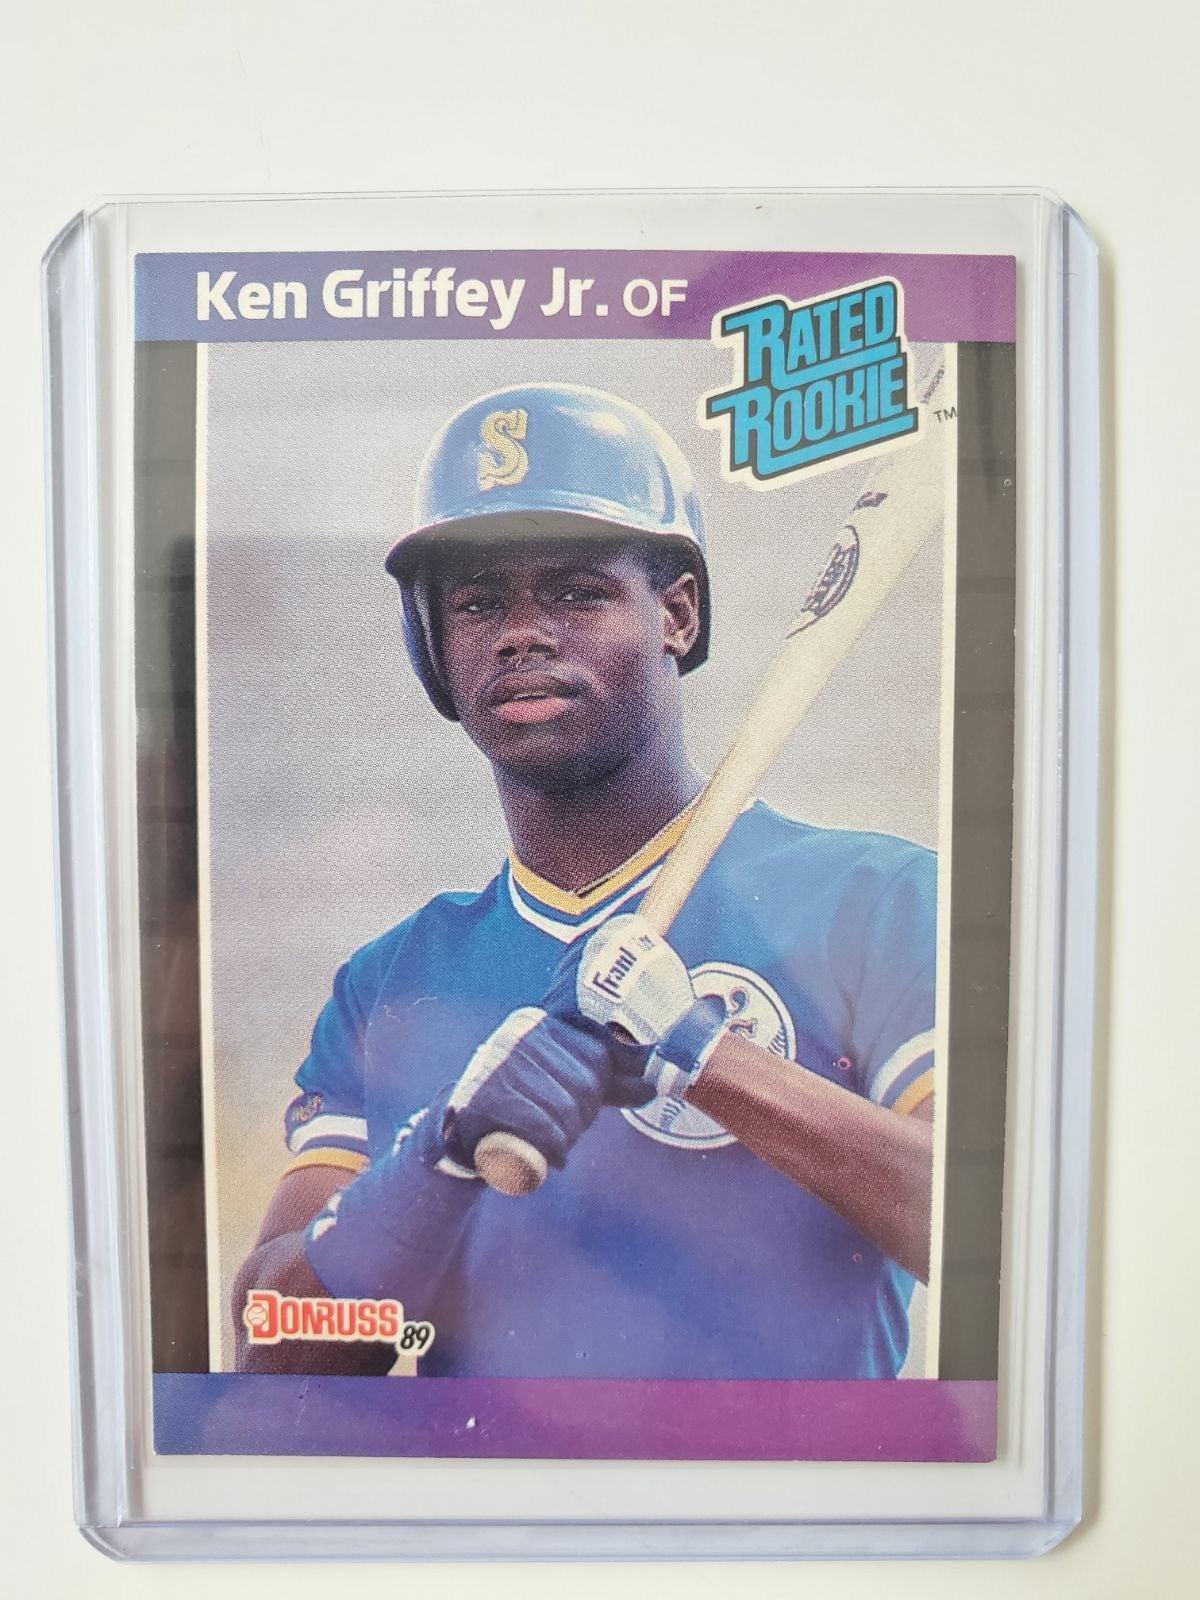 Ken Griffey Jr. Rookie card PAIR